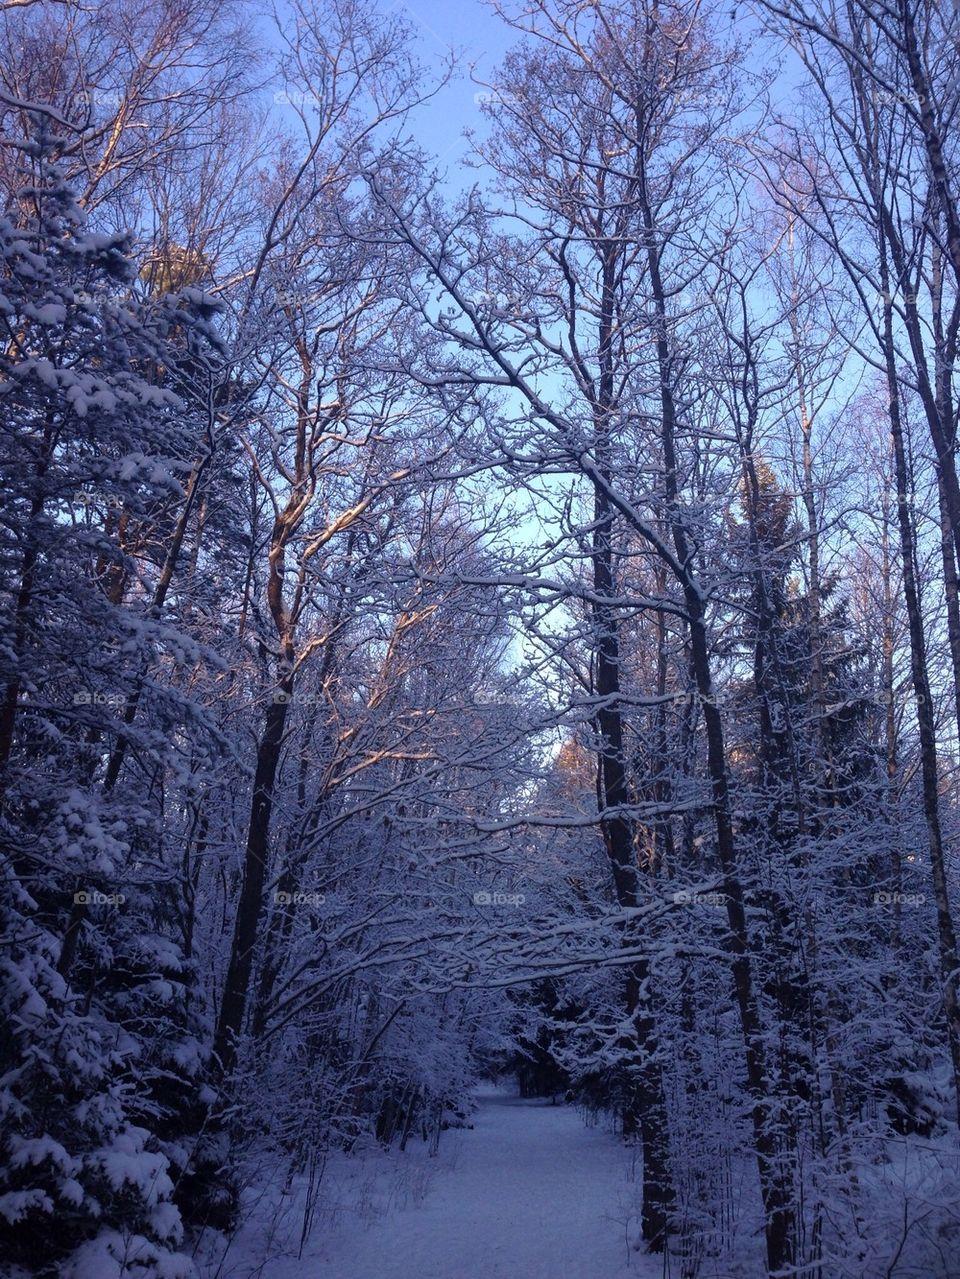 Winter in Forrest